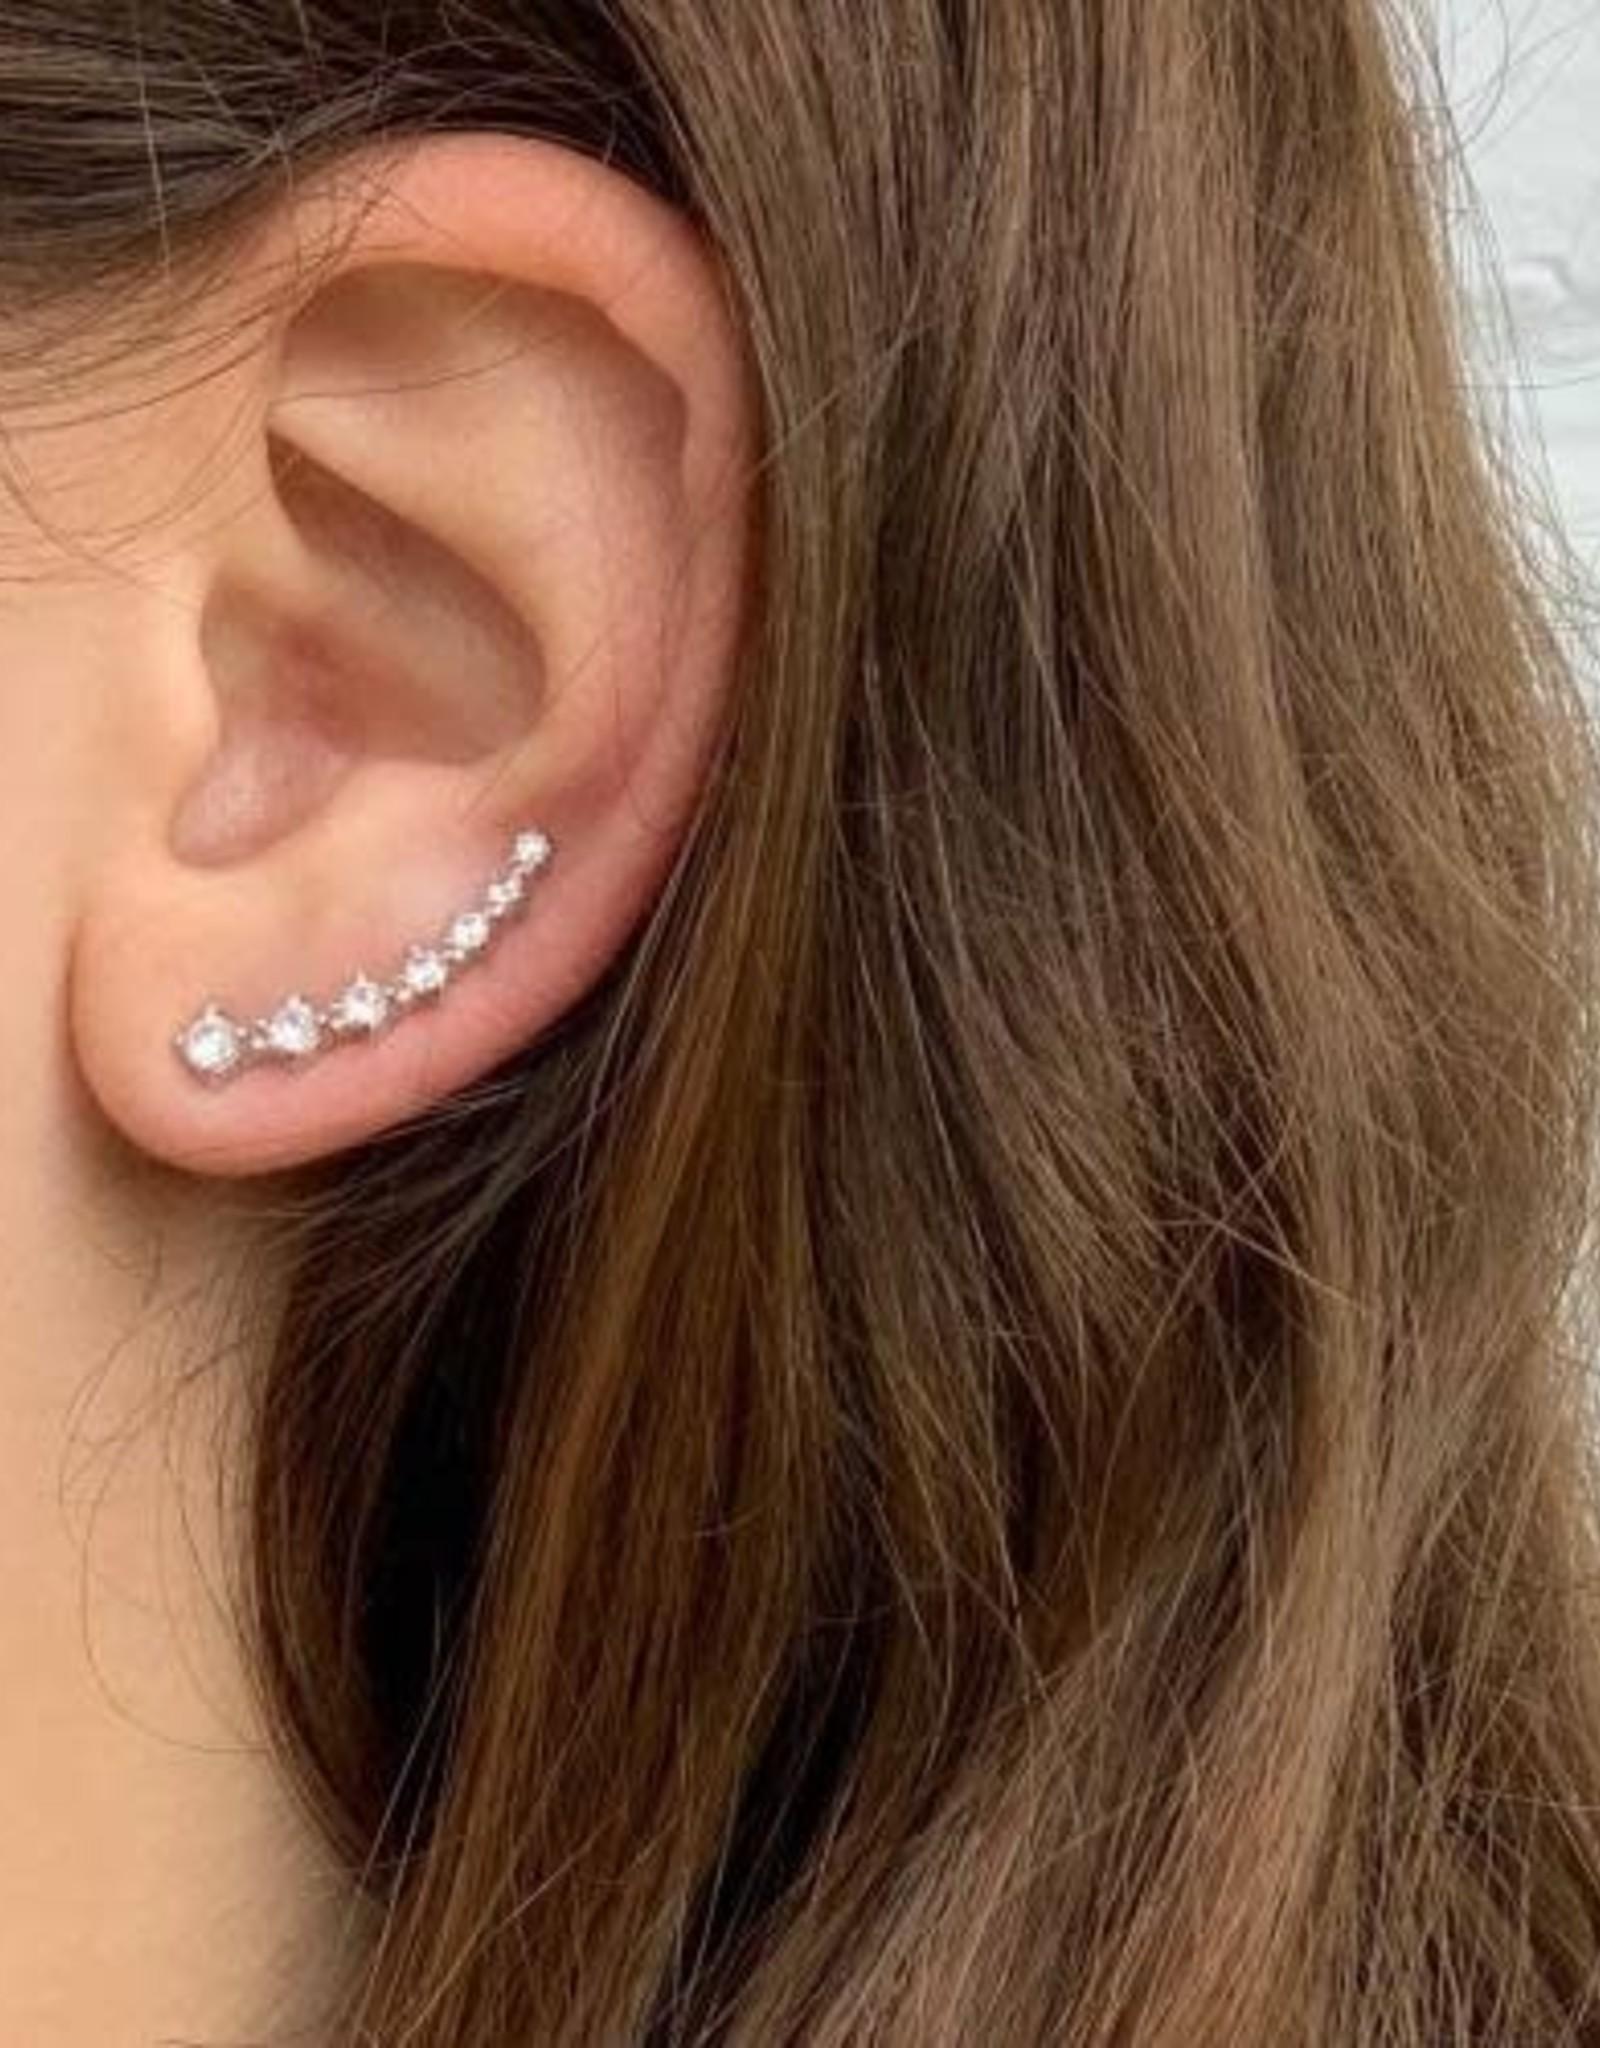 Global Crafts Earrings, Silver and Rhinestone Crawler